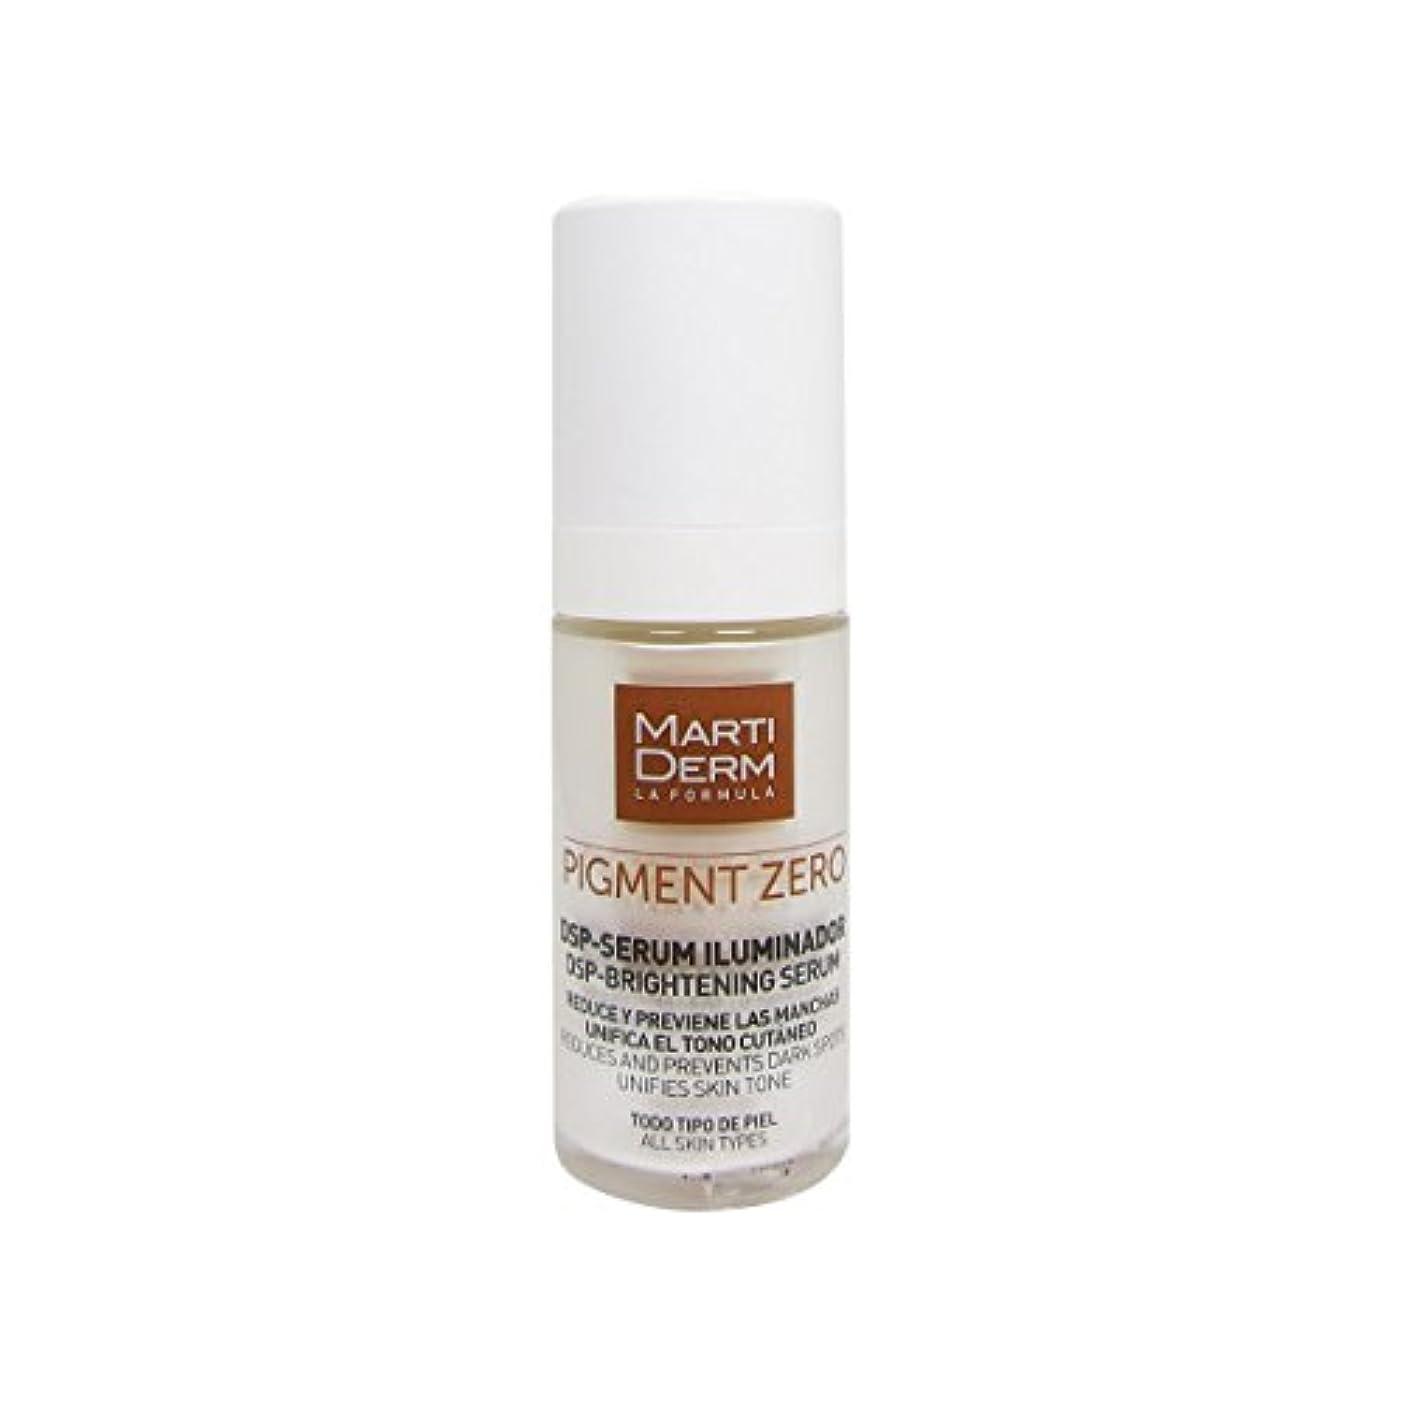 紛争天気未亡人Martiderm Pigment Zero Dsp-brightening Serum 30ml [並行輸入品]